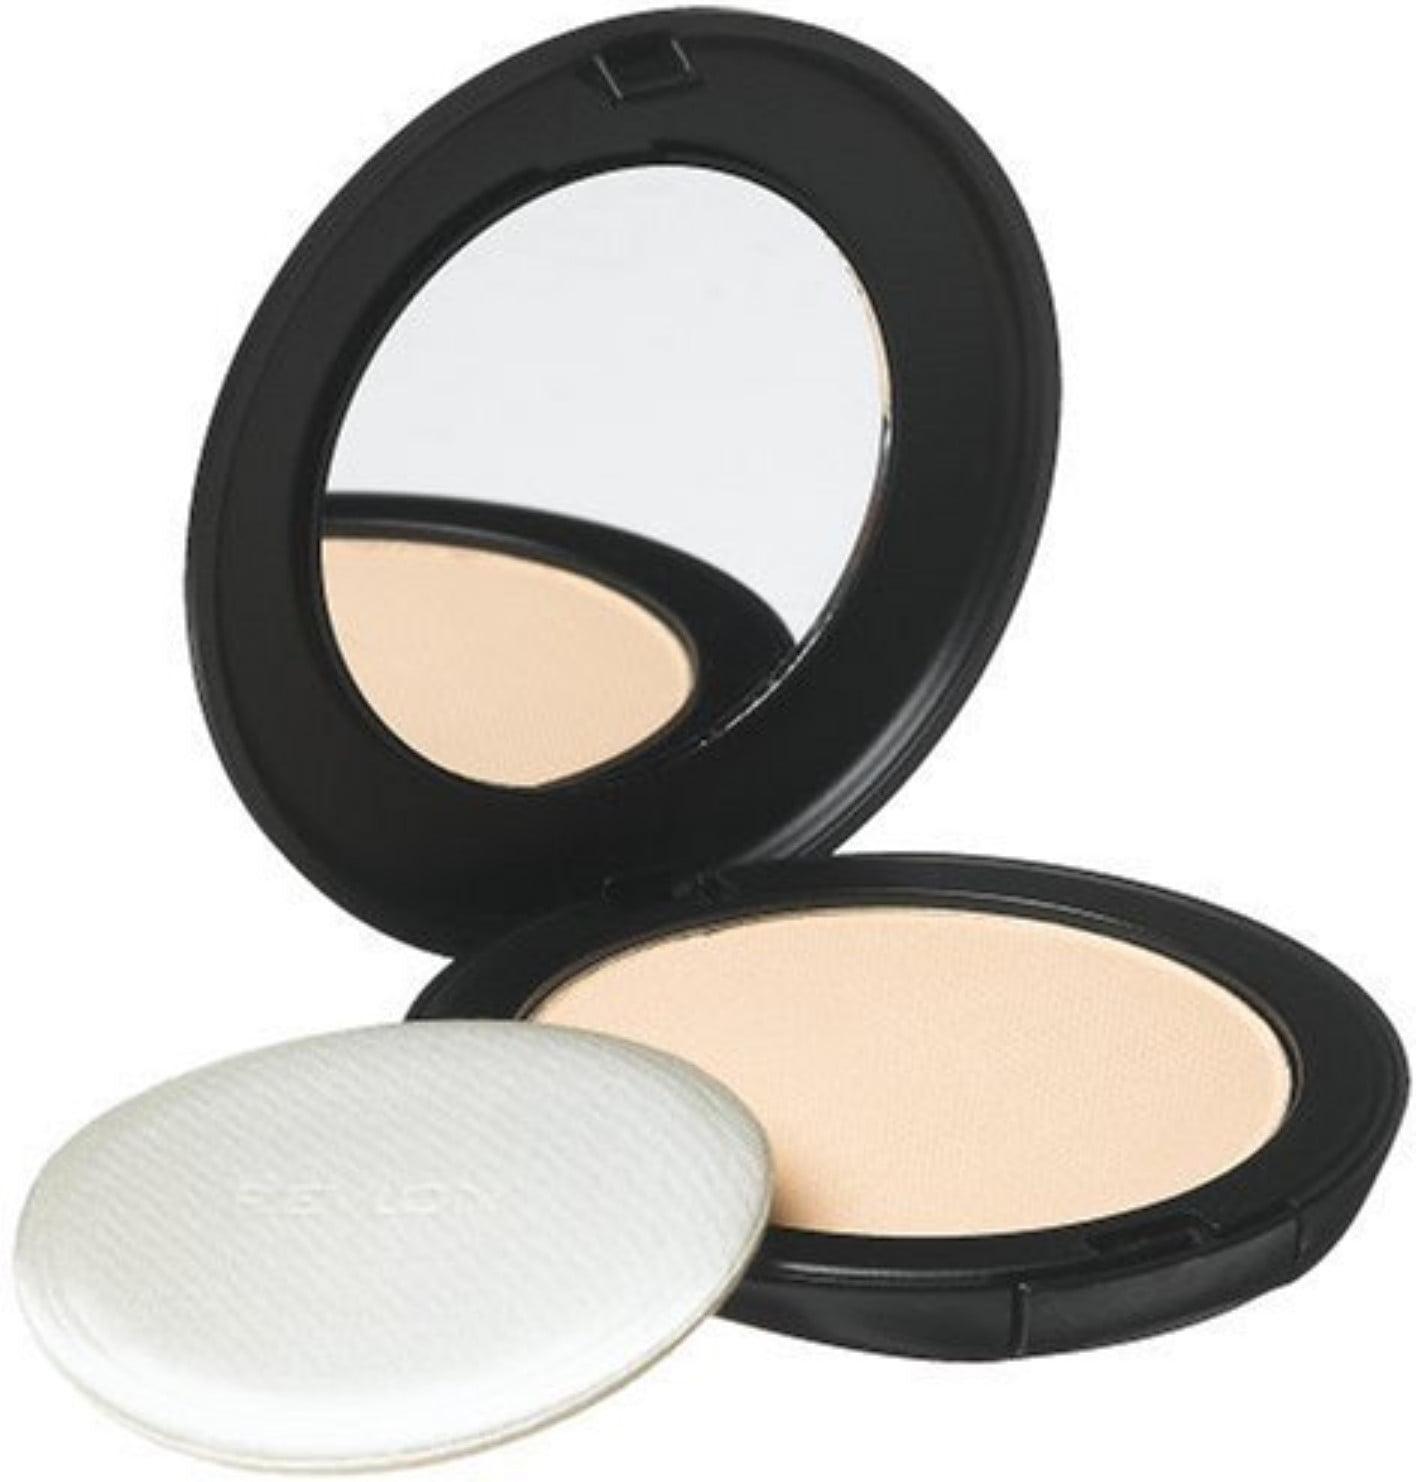 Revlon ColorStay Pressed Powder, Light [820] 0.3 oz (Pack of 4)